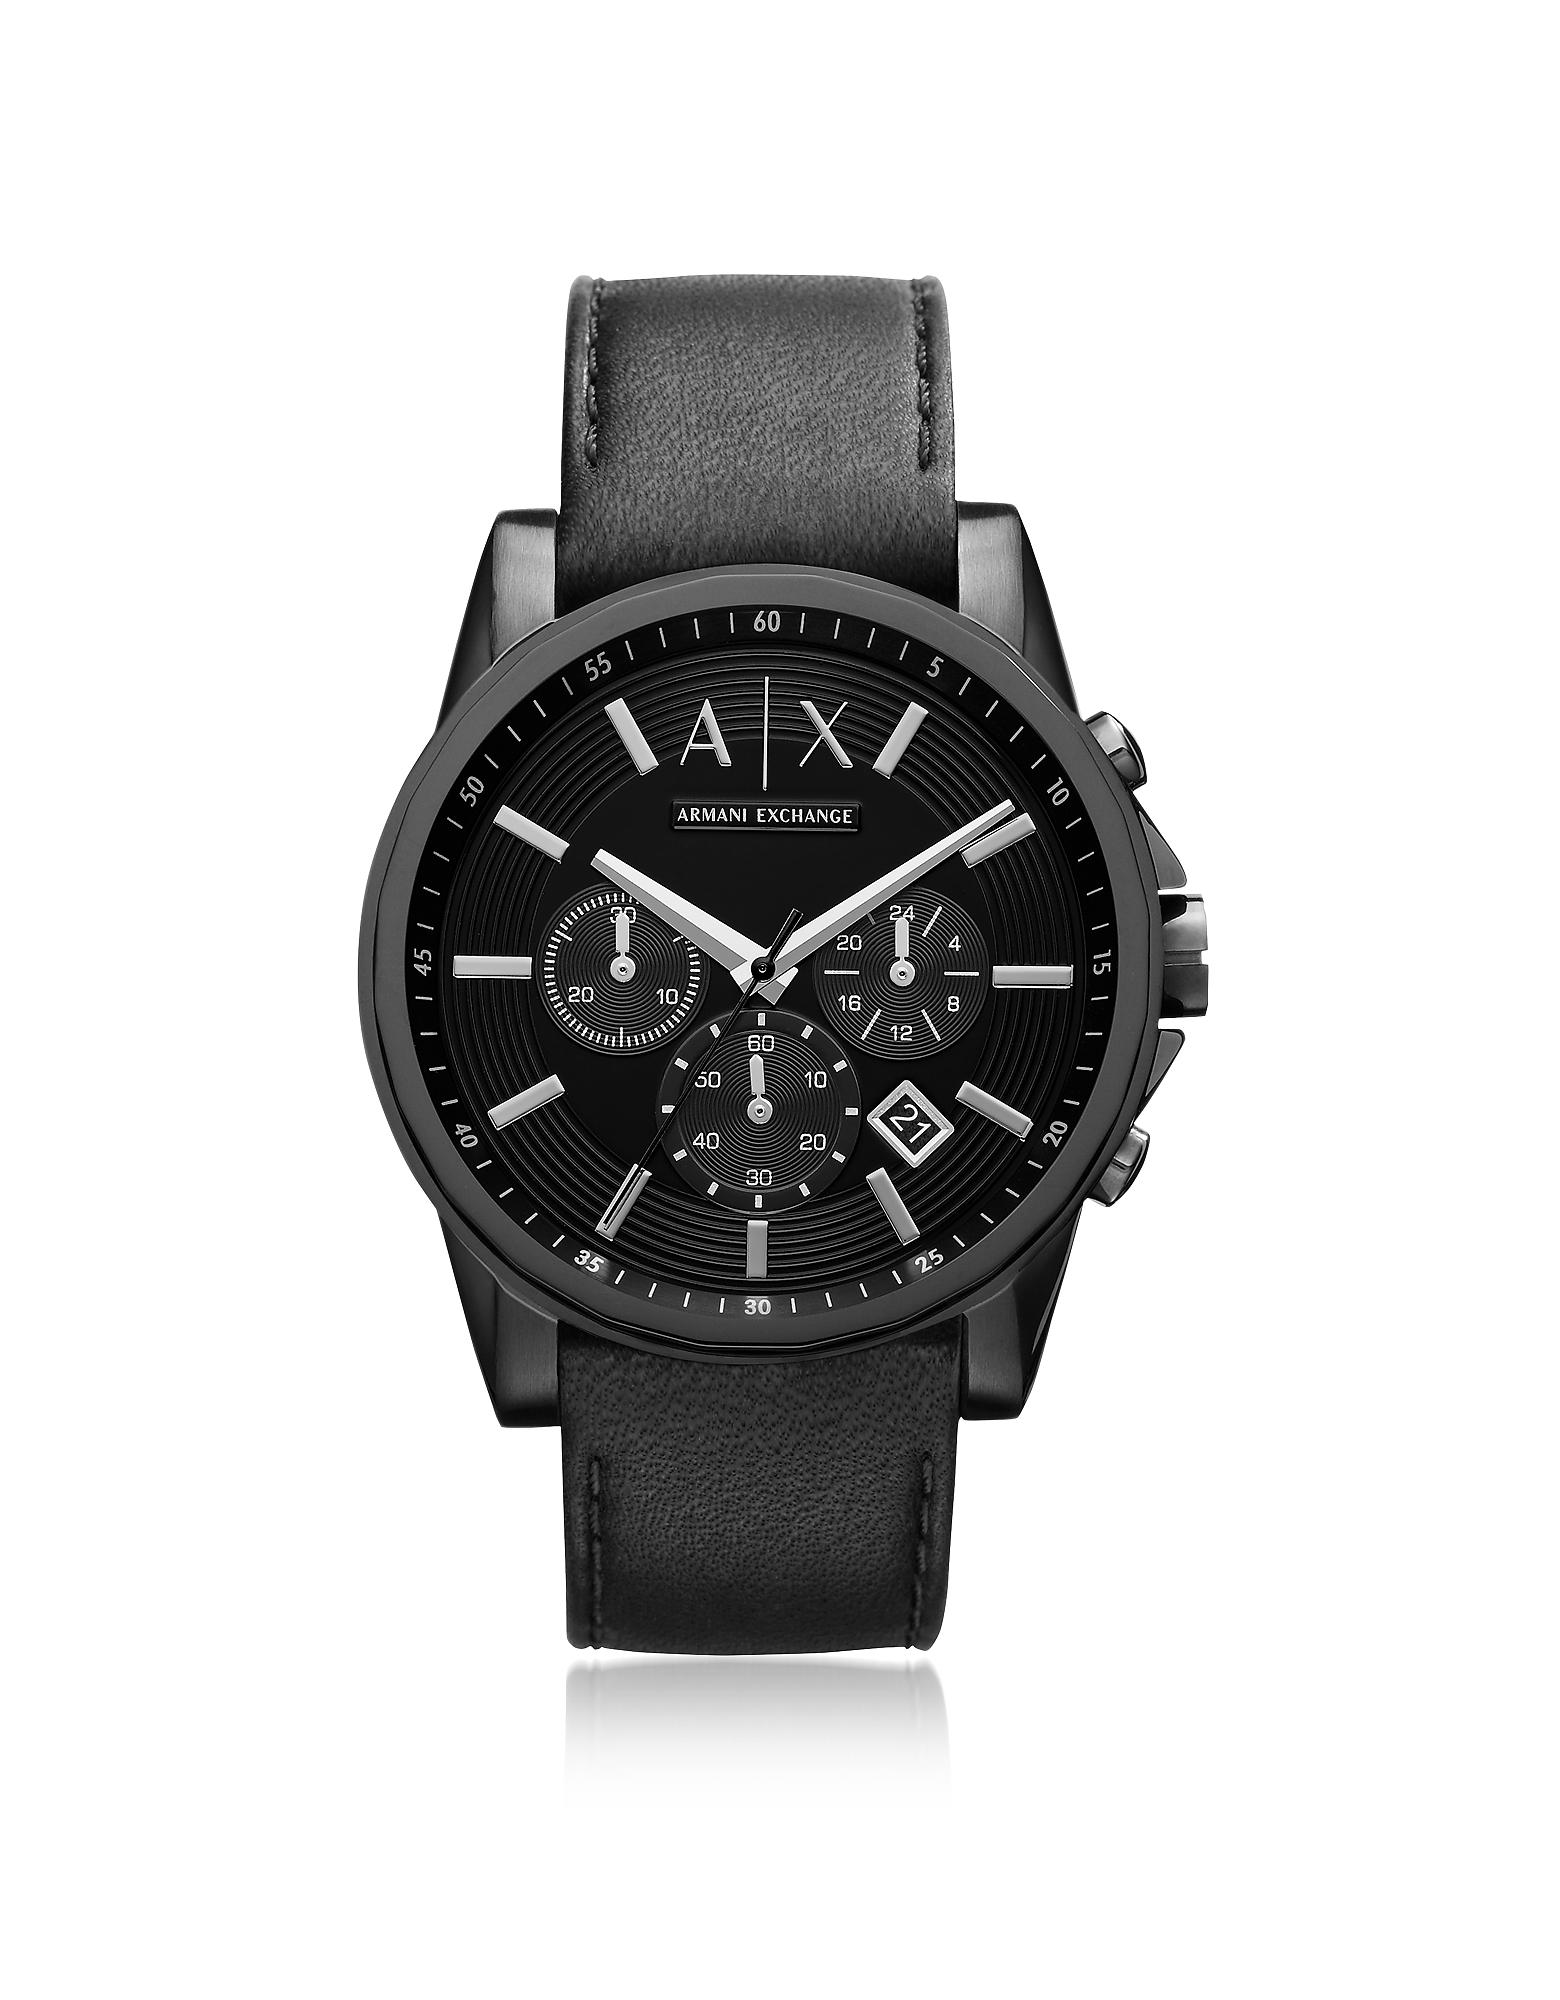 Armani Exchange Men's Watches, Outerbanks Black Leather Men's Watch